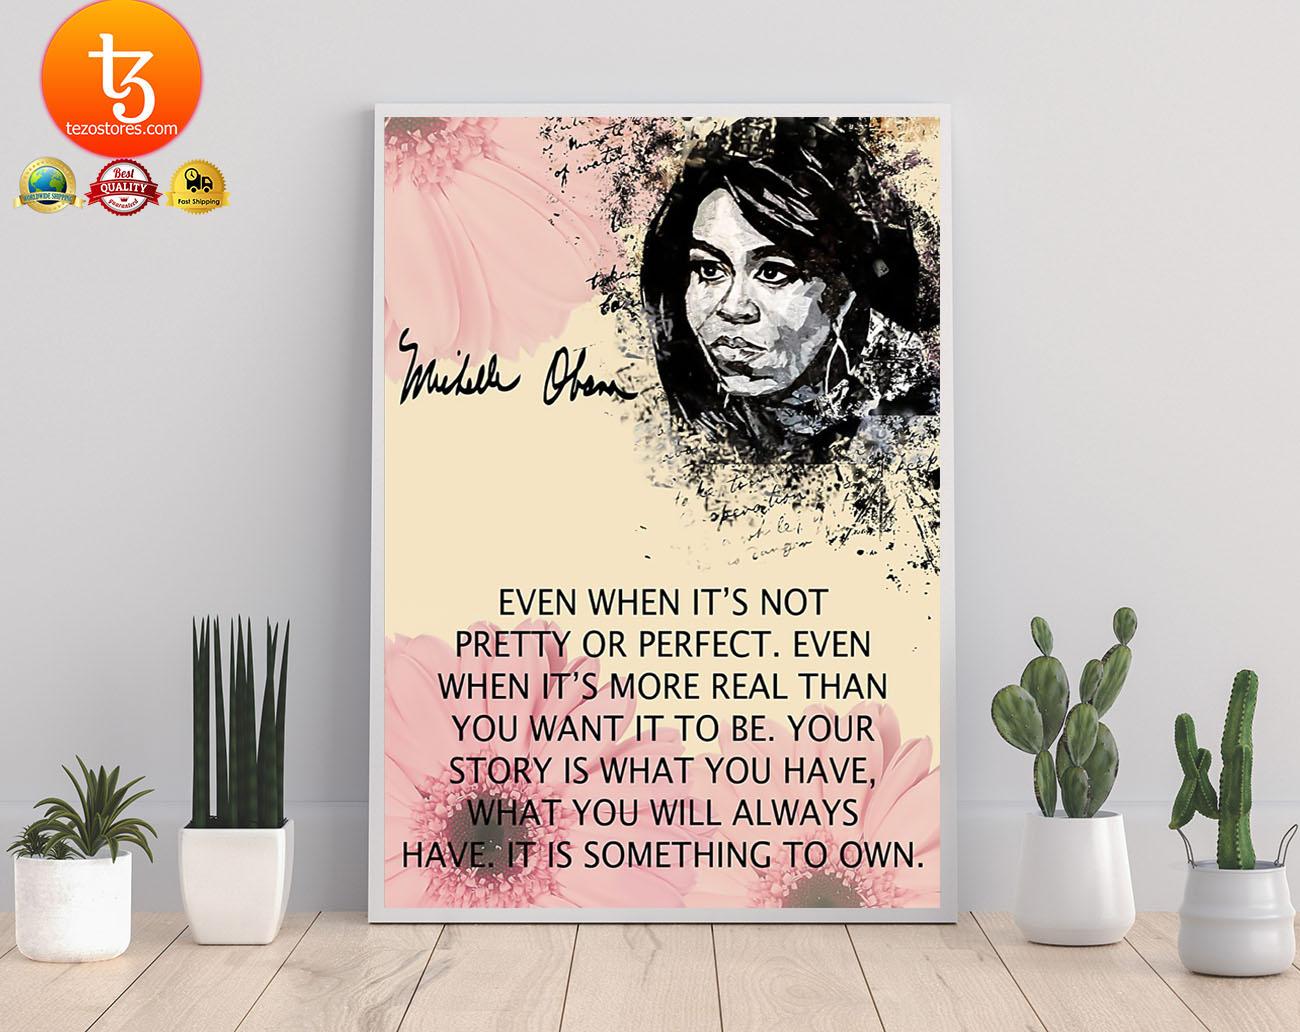 Michelle Obama even when it's not pretty or perfect poster 21